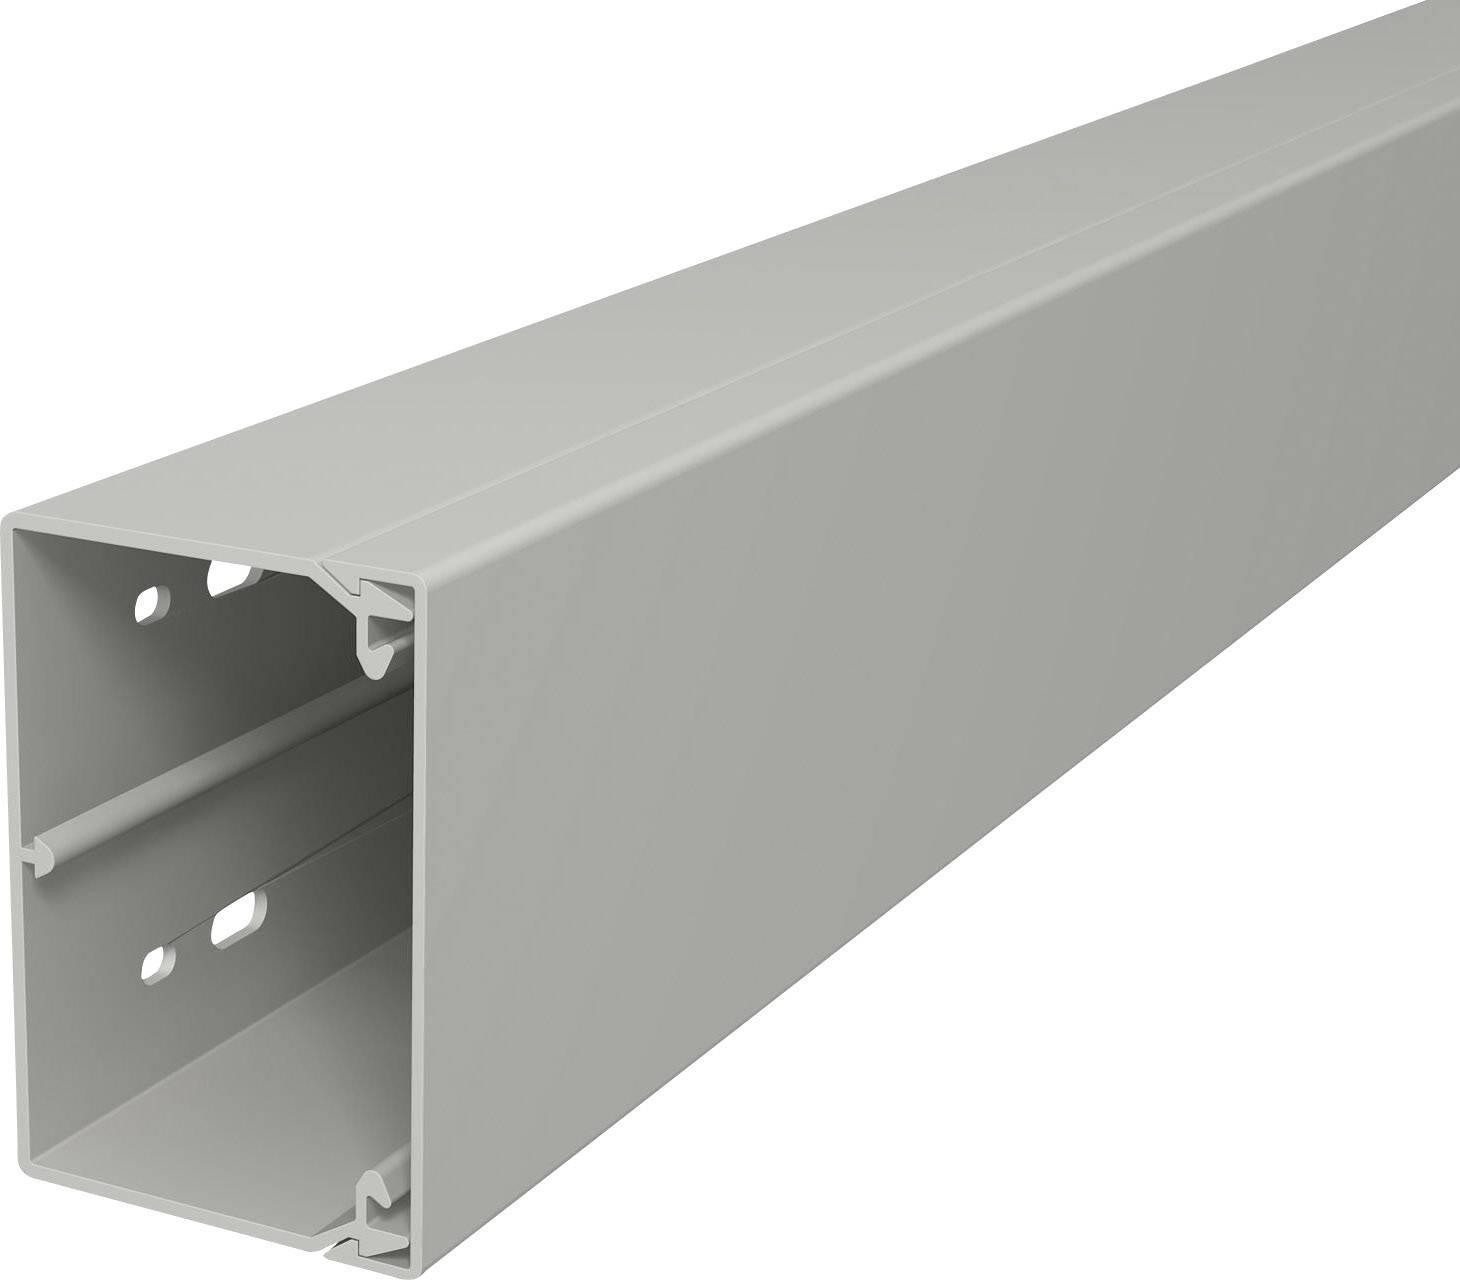 Elektroinstalační lišta s krytem OBO Bettermann, 6189598, 60 x 90 mm, 2 m, šedá